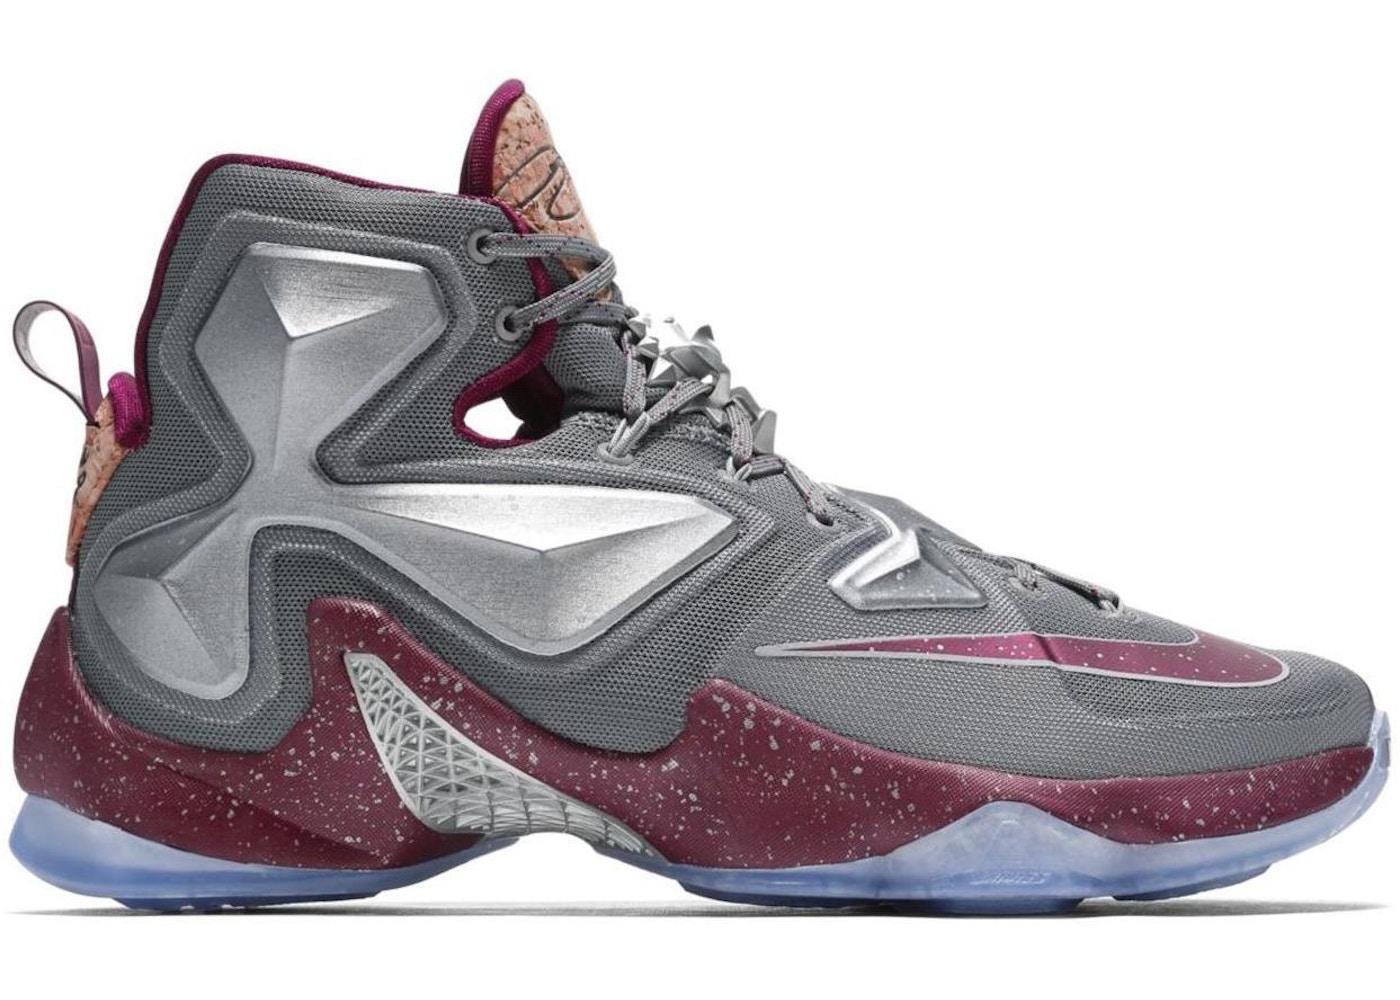 3e154c0d53d3 Nike LeBron 13 Shoes - Average Sale Price